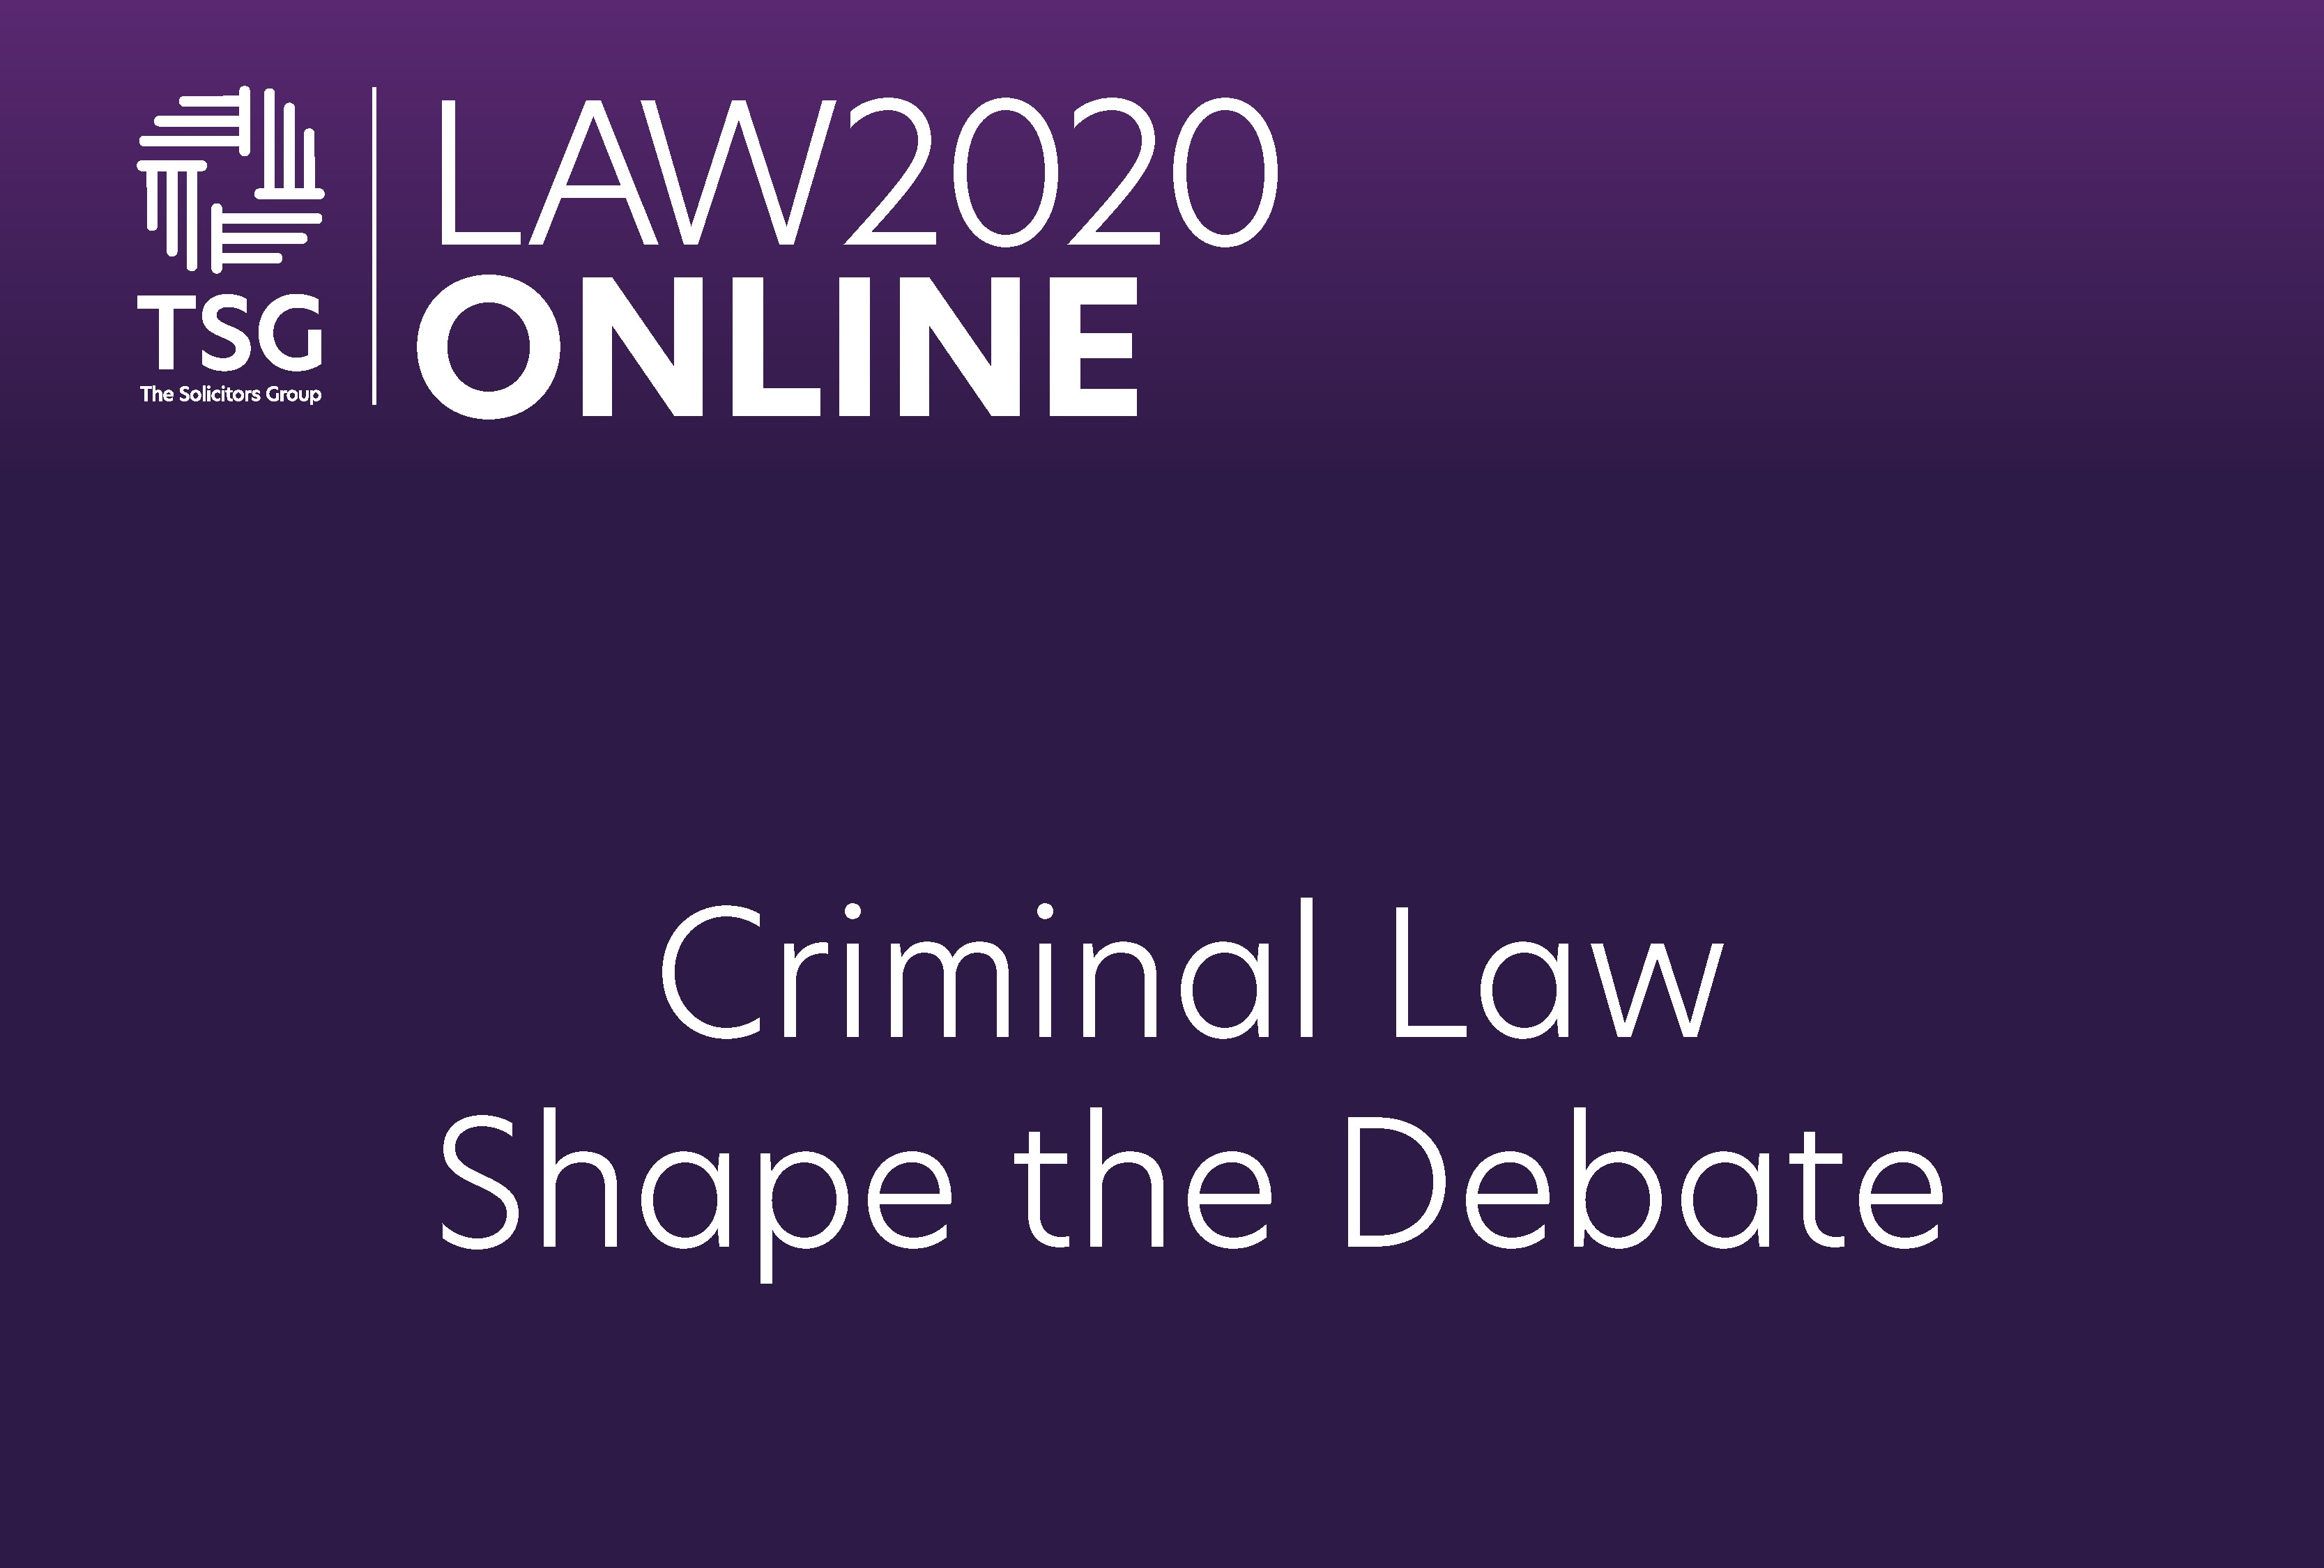 Criminal Law Shape the Debate